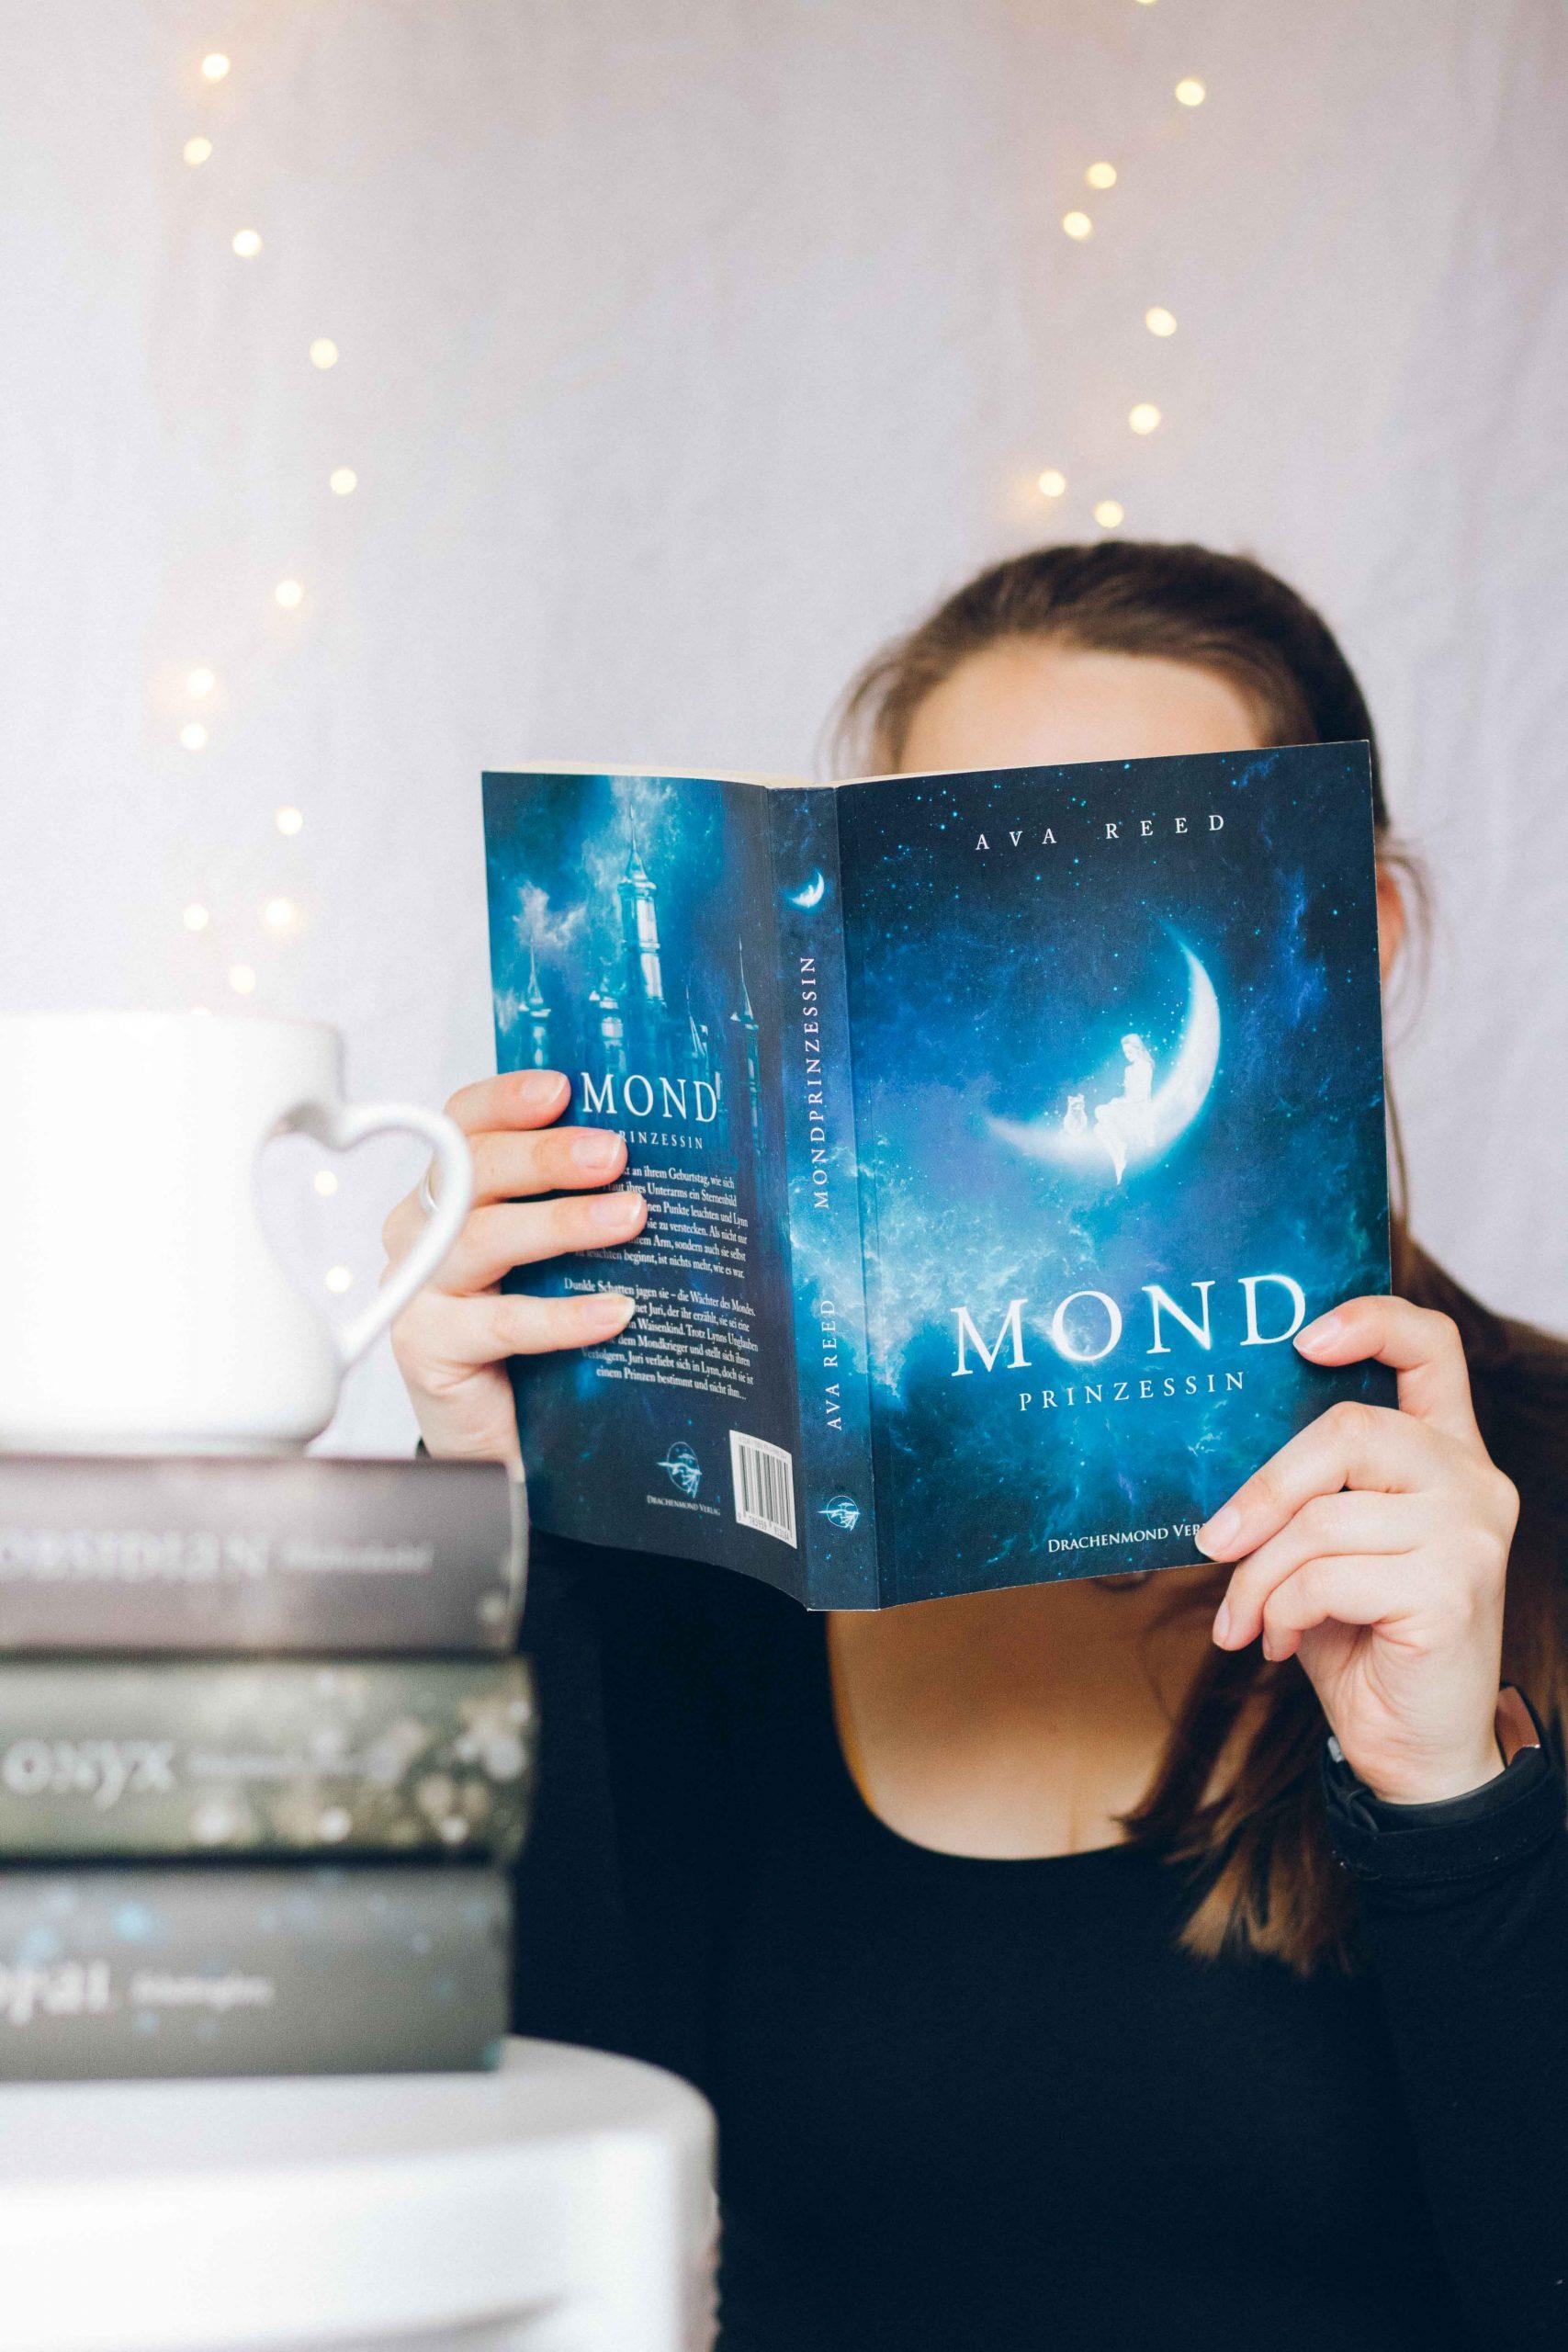 Mondprinzessin | Ava Reed